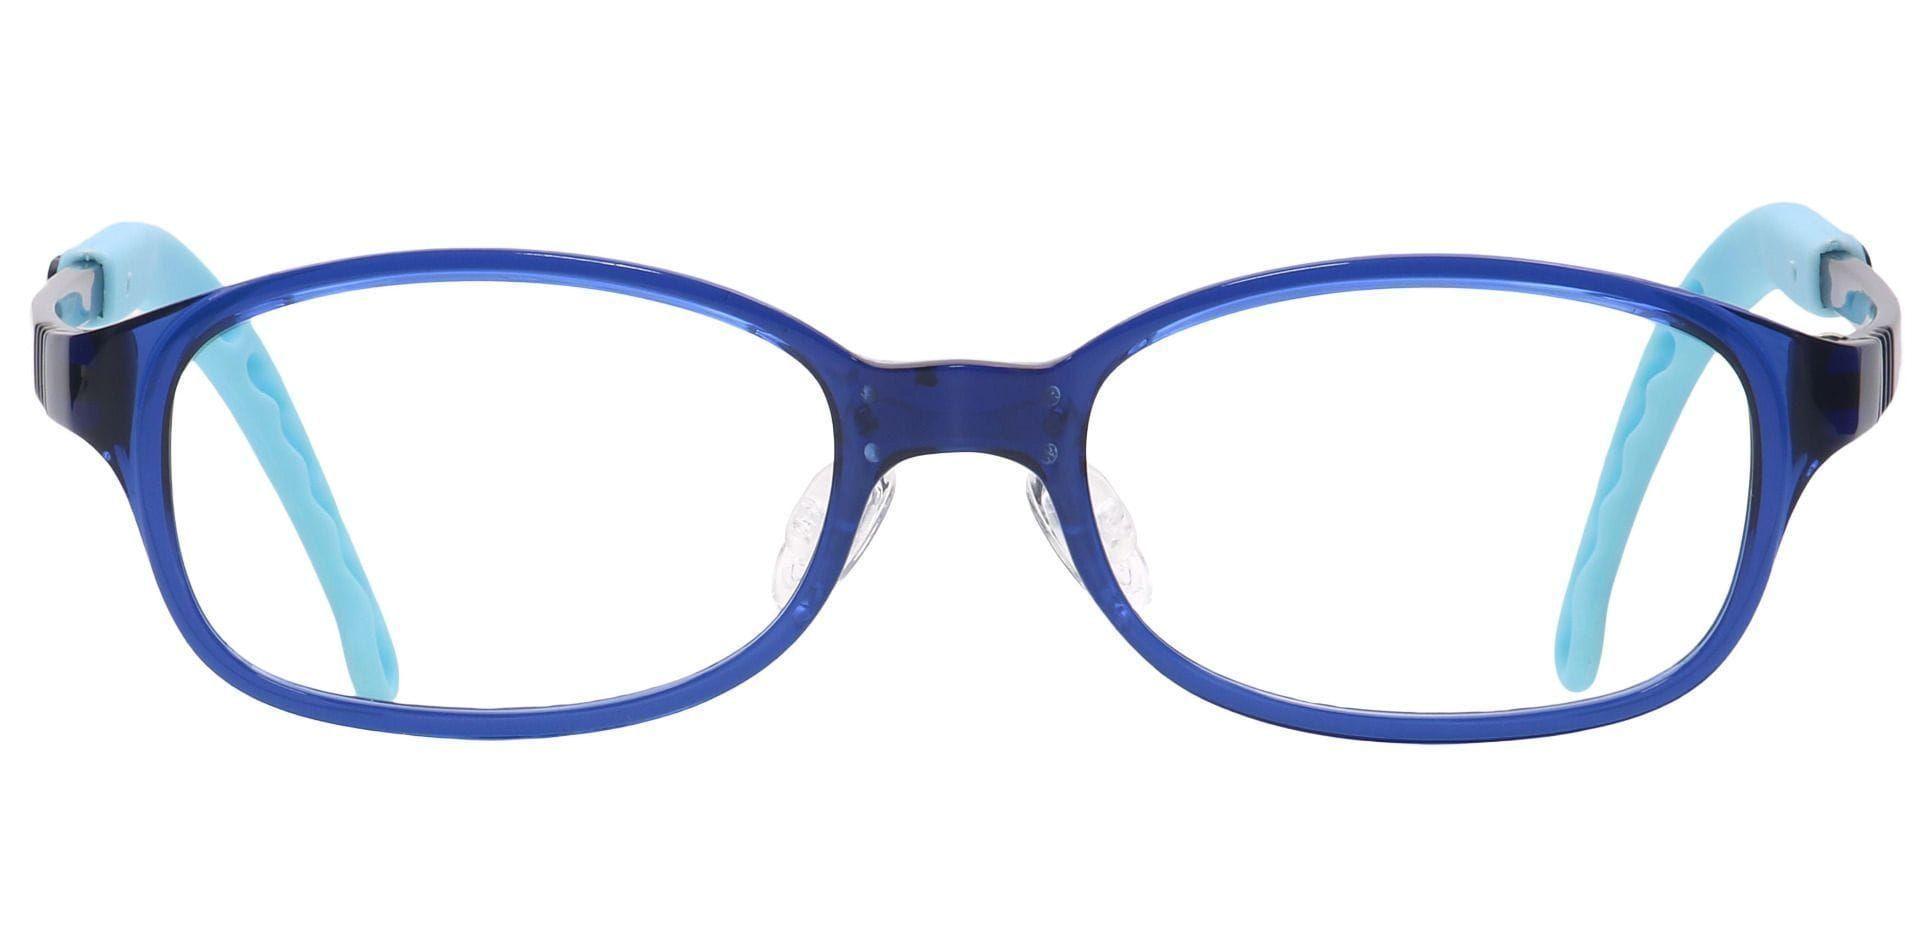 Dainty Rectangle Prescription Glasses - Blue